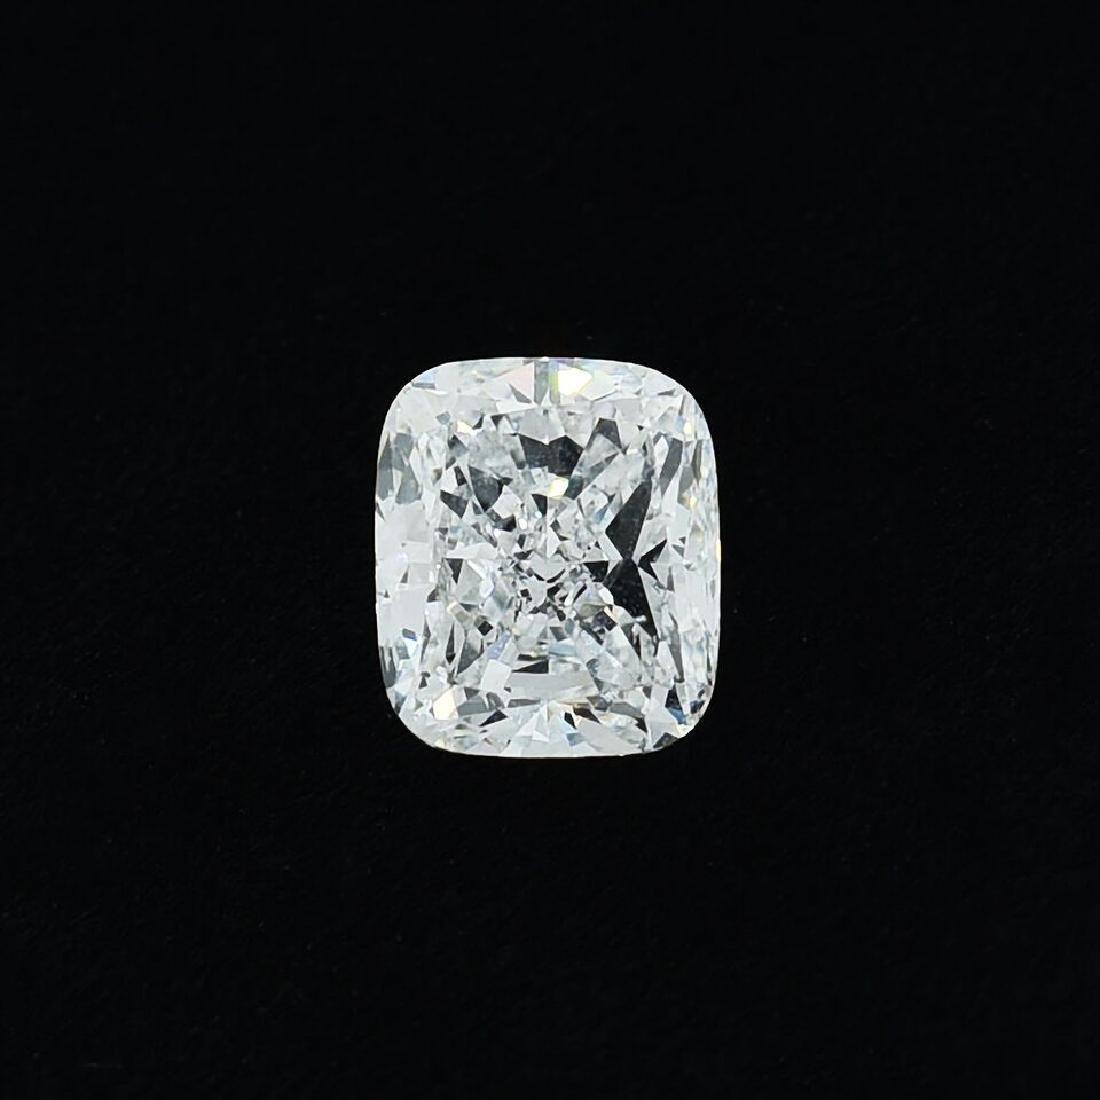 2.01ct VS2 Clarity Diamond Loose Stone (GIA Certified)